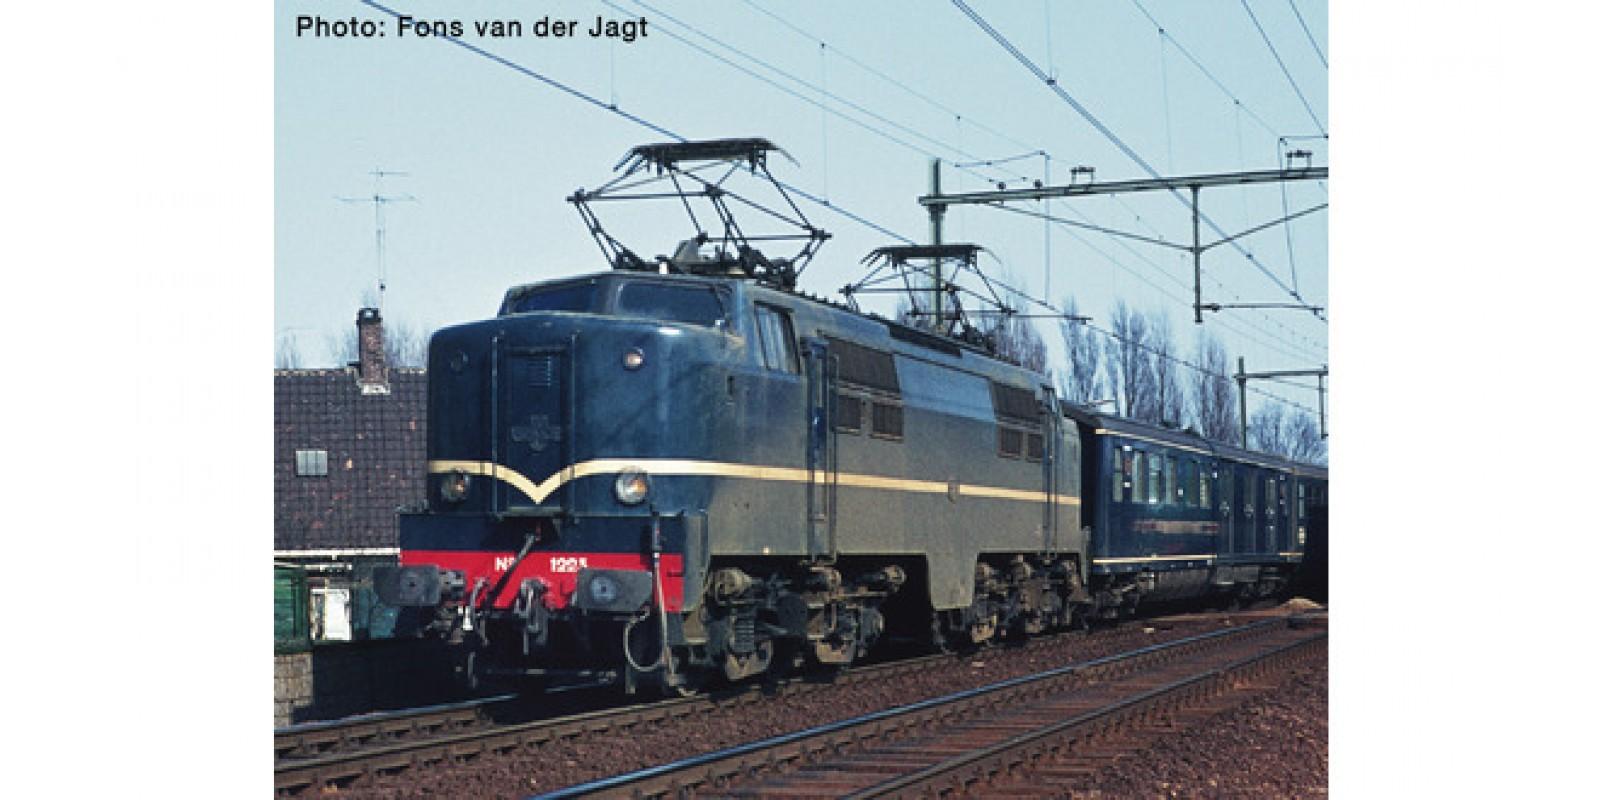 RO73833 - Electric locomotive 1207, NS